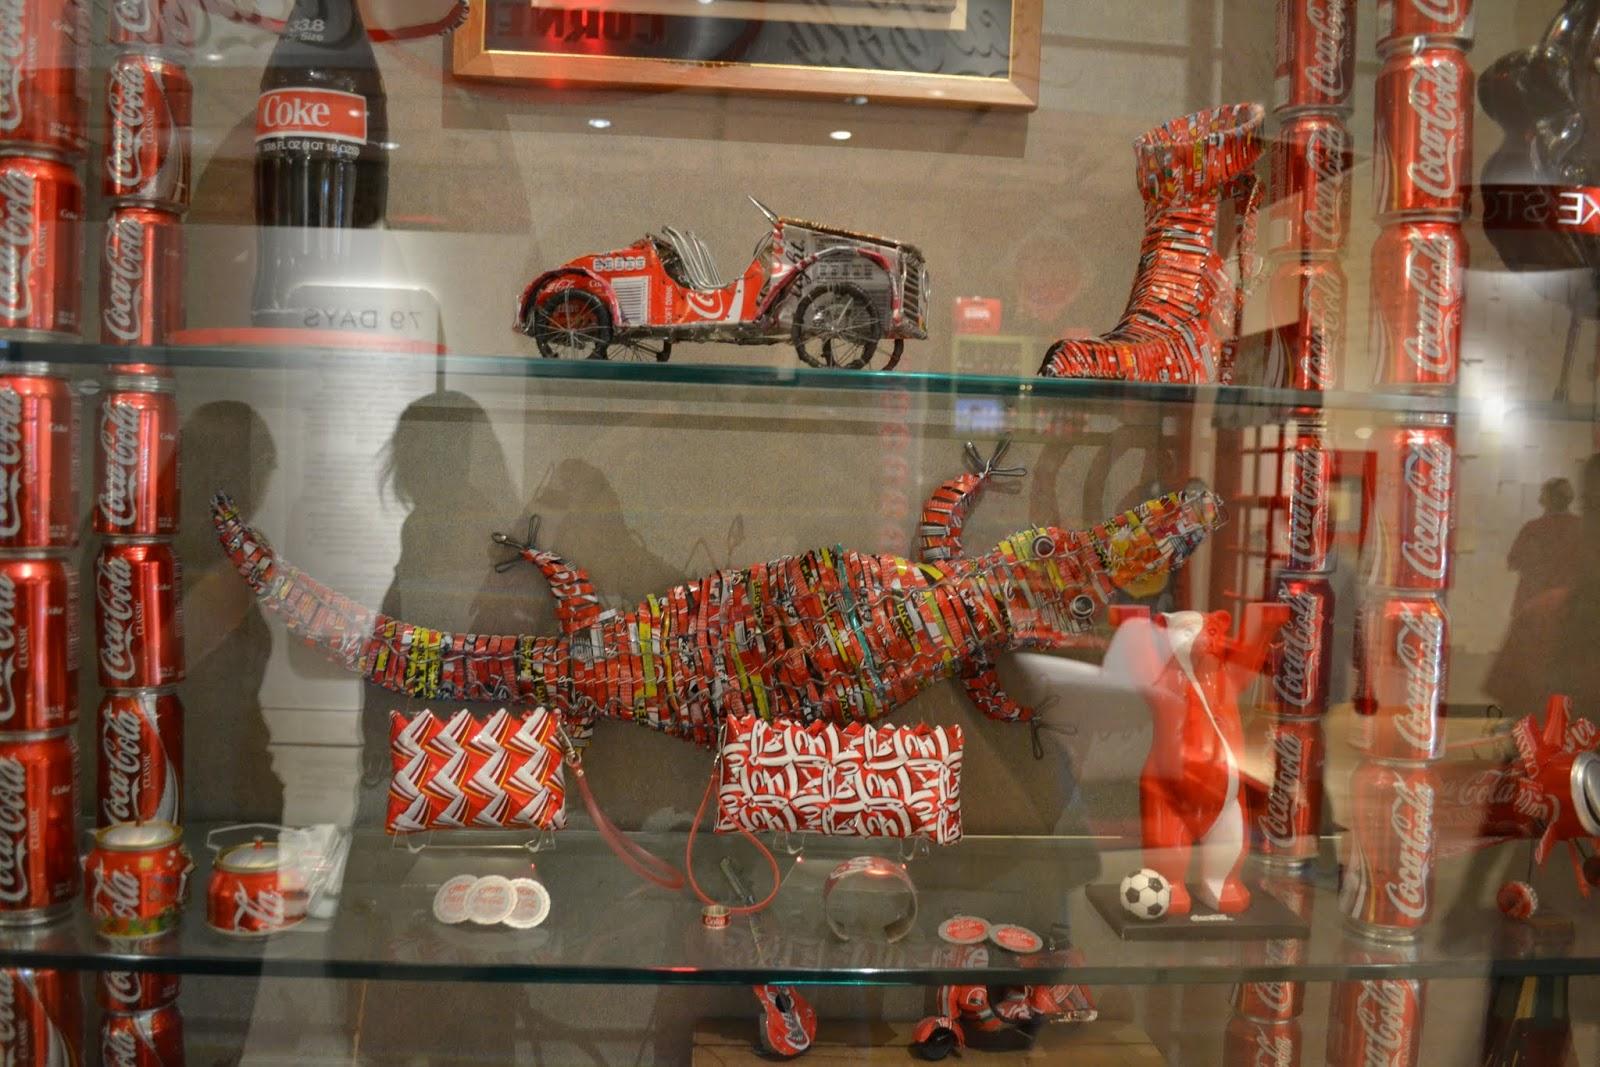 Музей Кока-Колы, Атланта (World of Coca-Cola, Atlanta, GA)